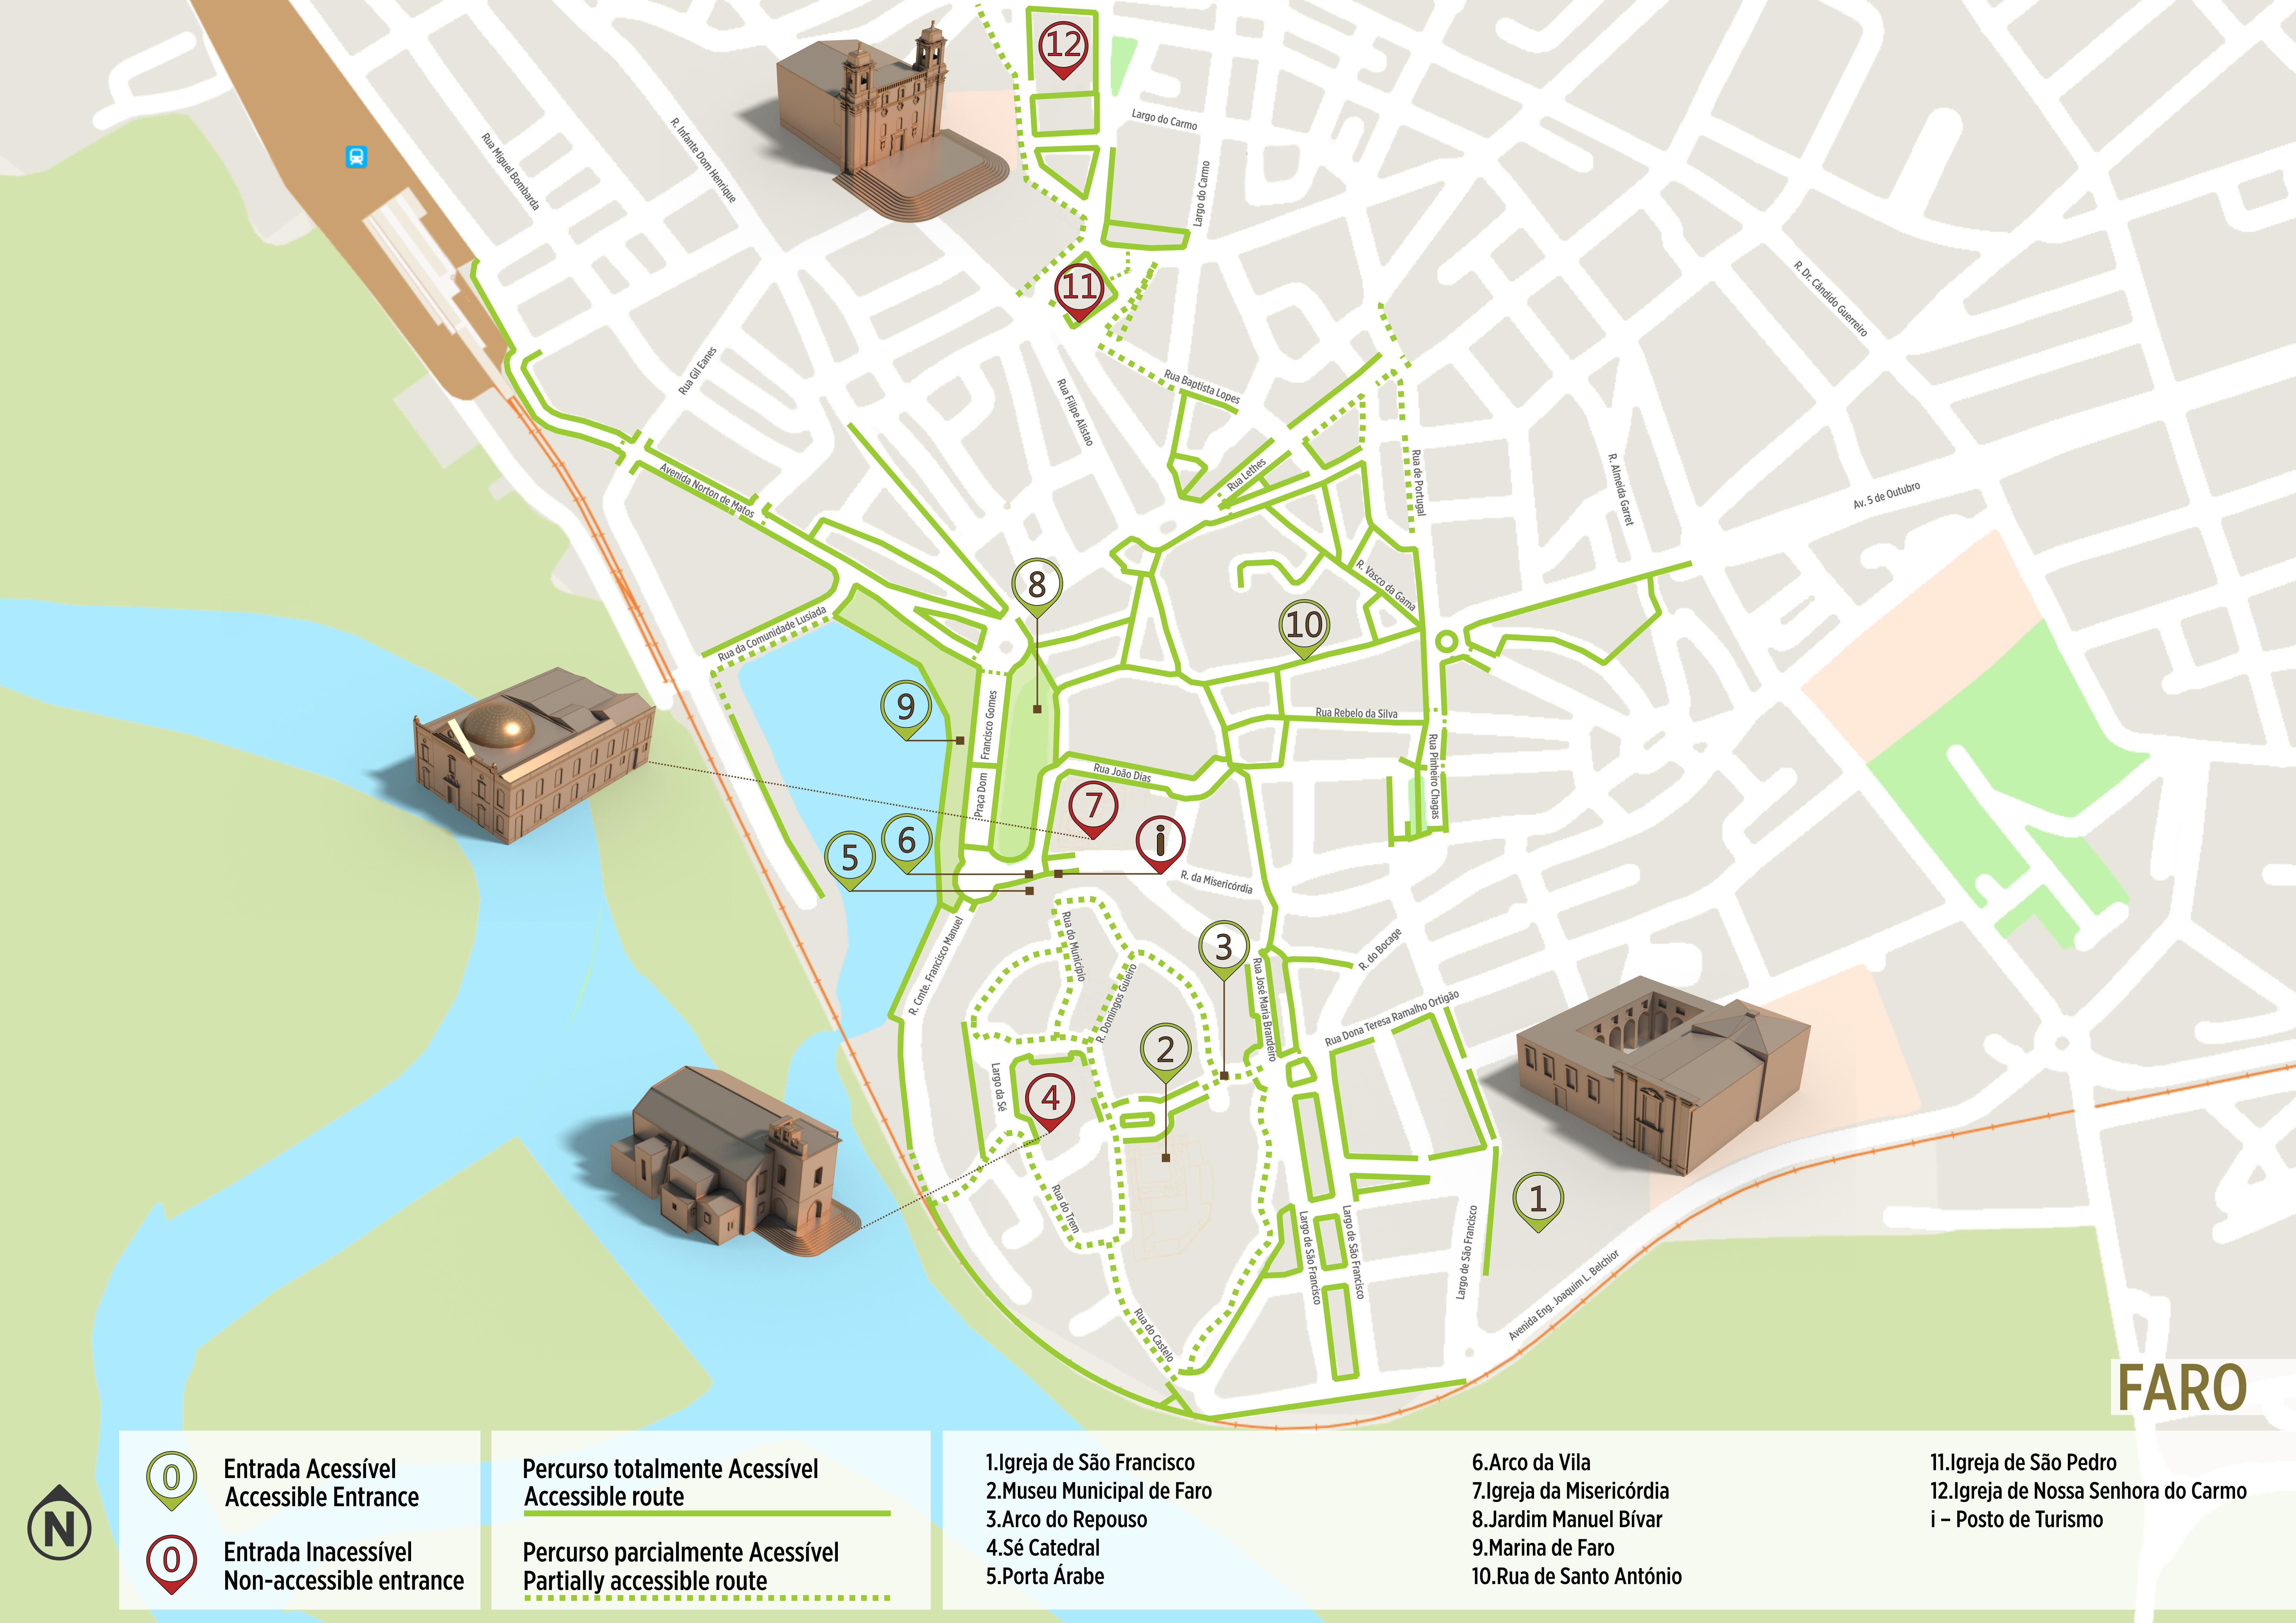 mapa ruas portugal Faro   Itinerário Acessível | .visitportugal.com mapa ruas portugal